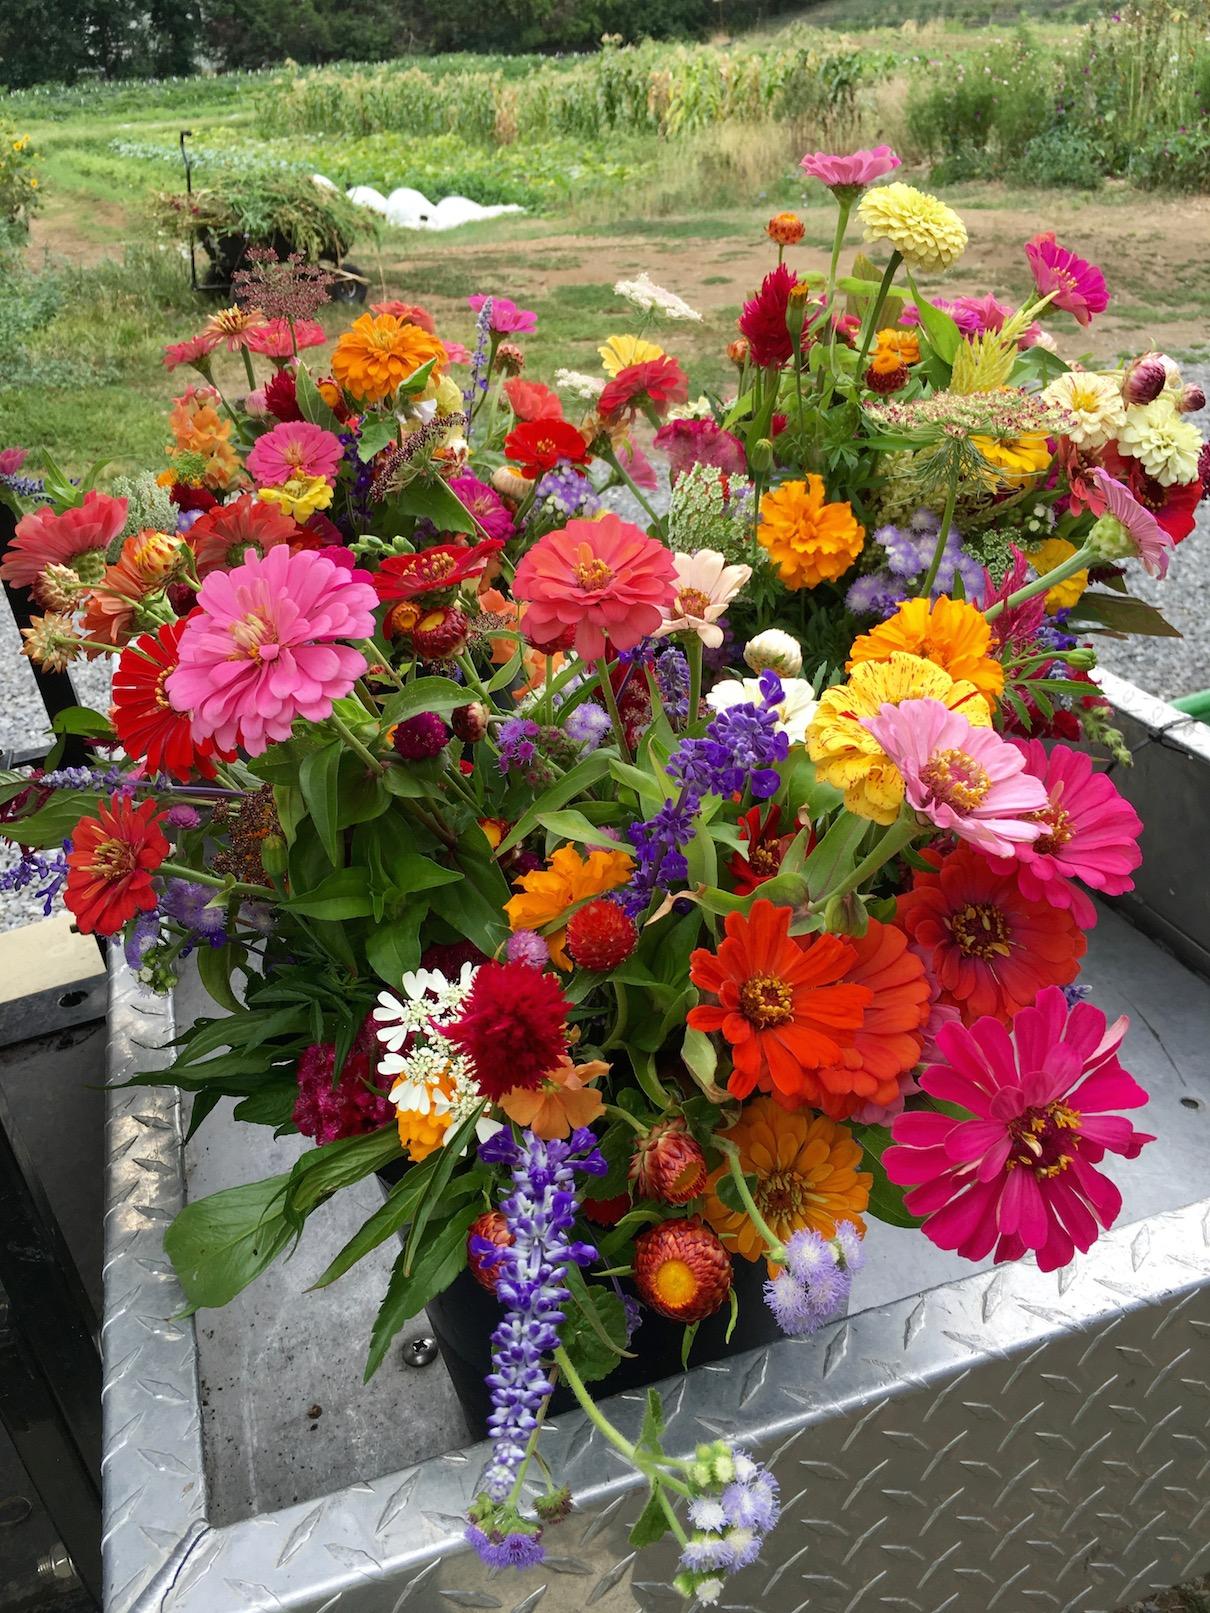 Flower bouquet at Wright-Locke Farm (Ruth Trimarchi)